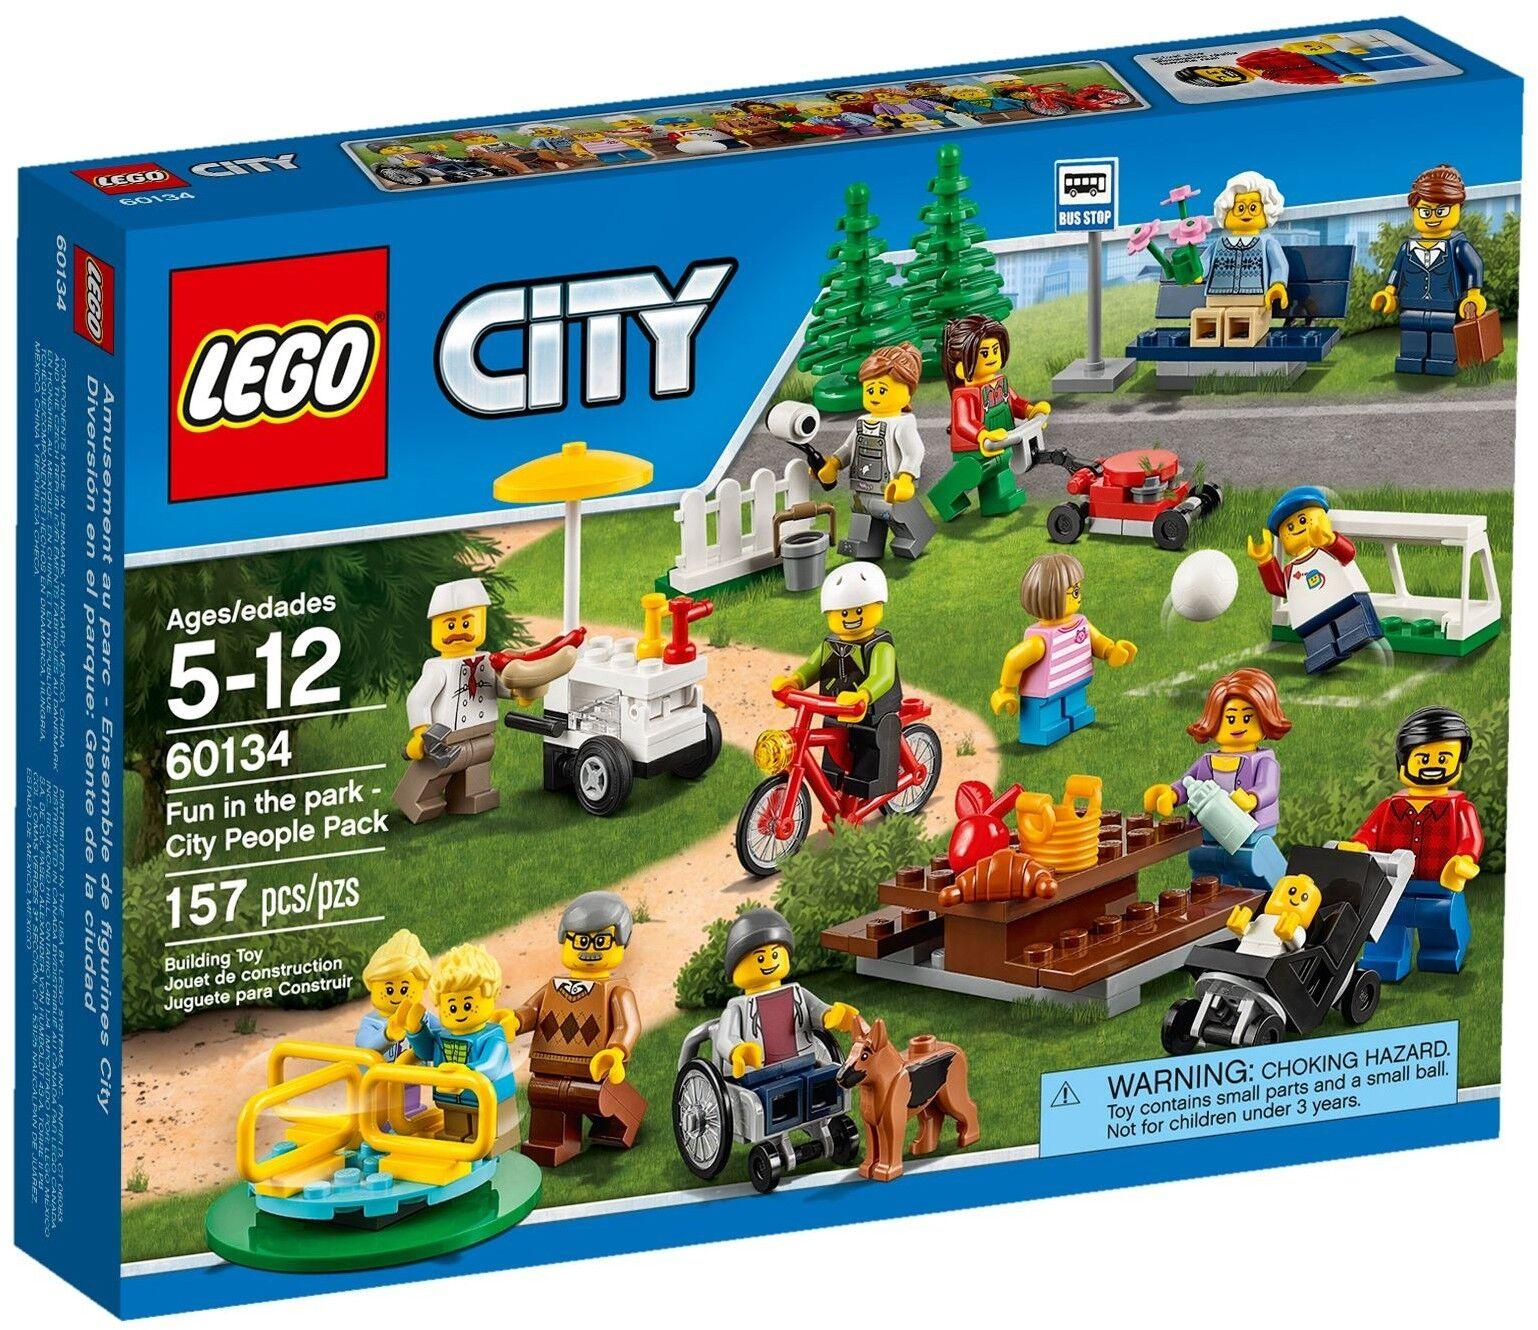 Lego Sealed Set RARE RARE RARE New in Box Fun in the Park w Minifigures City 259434